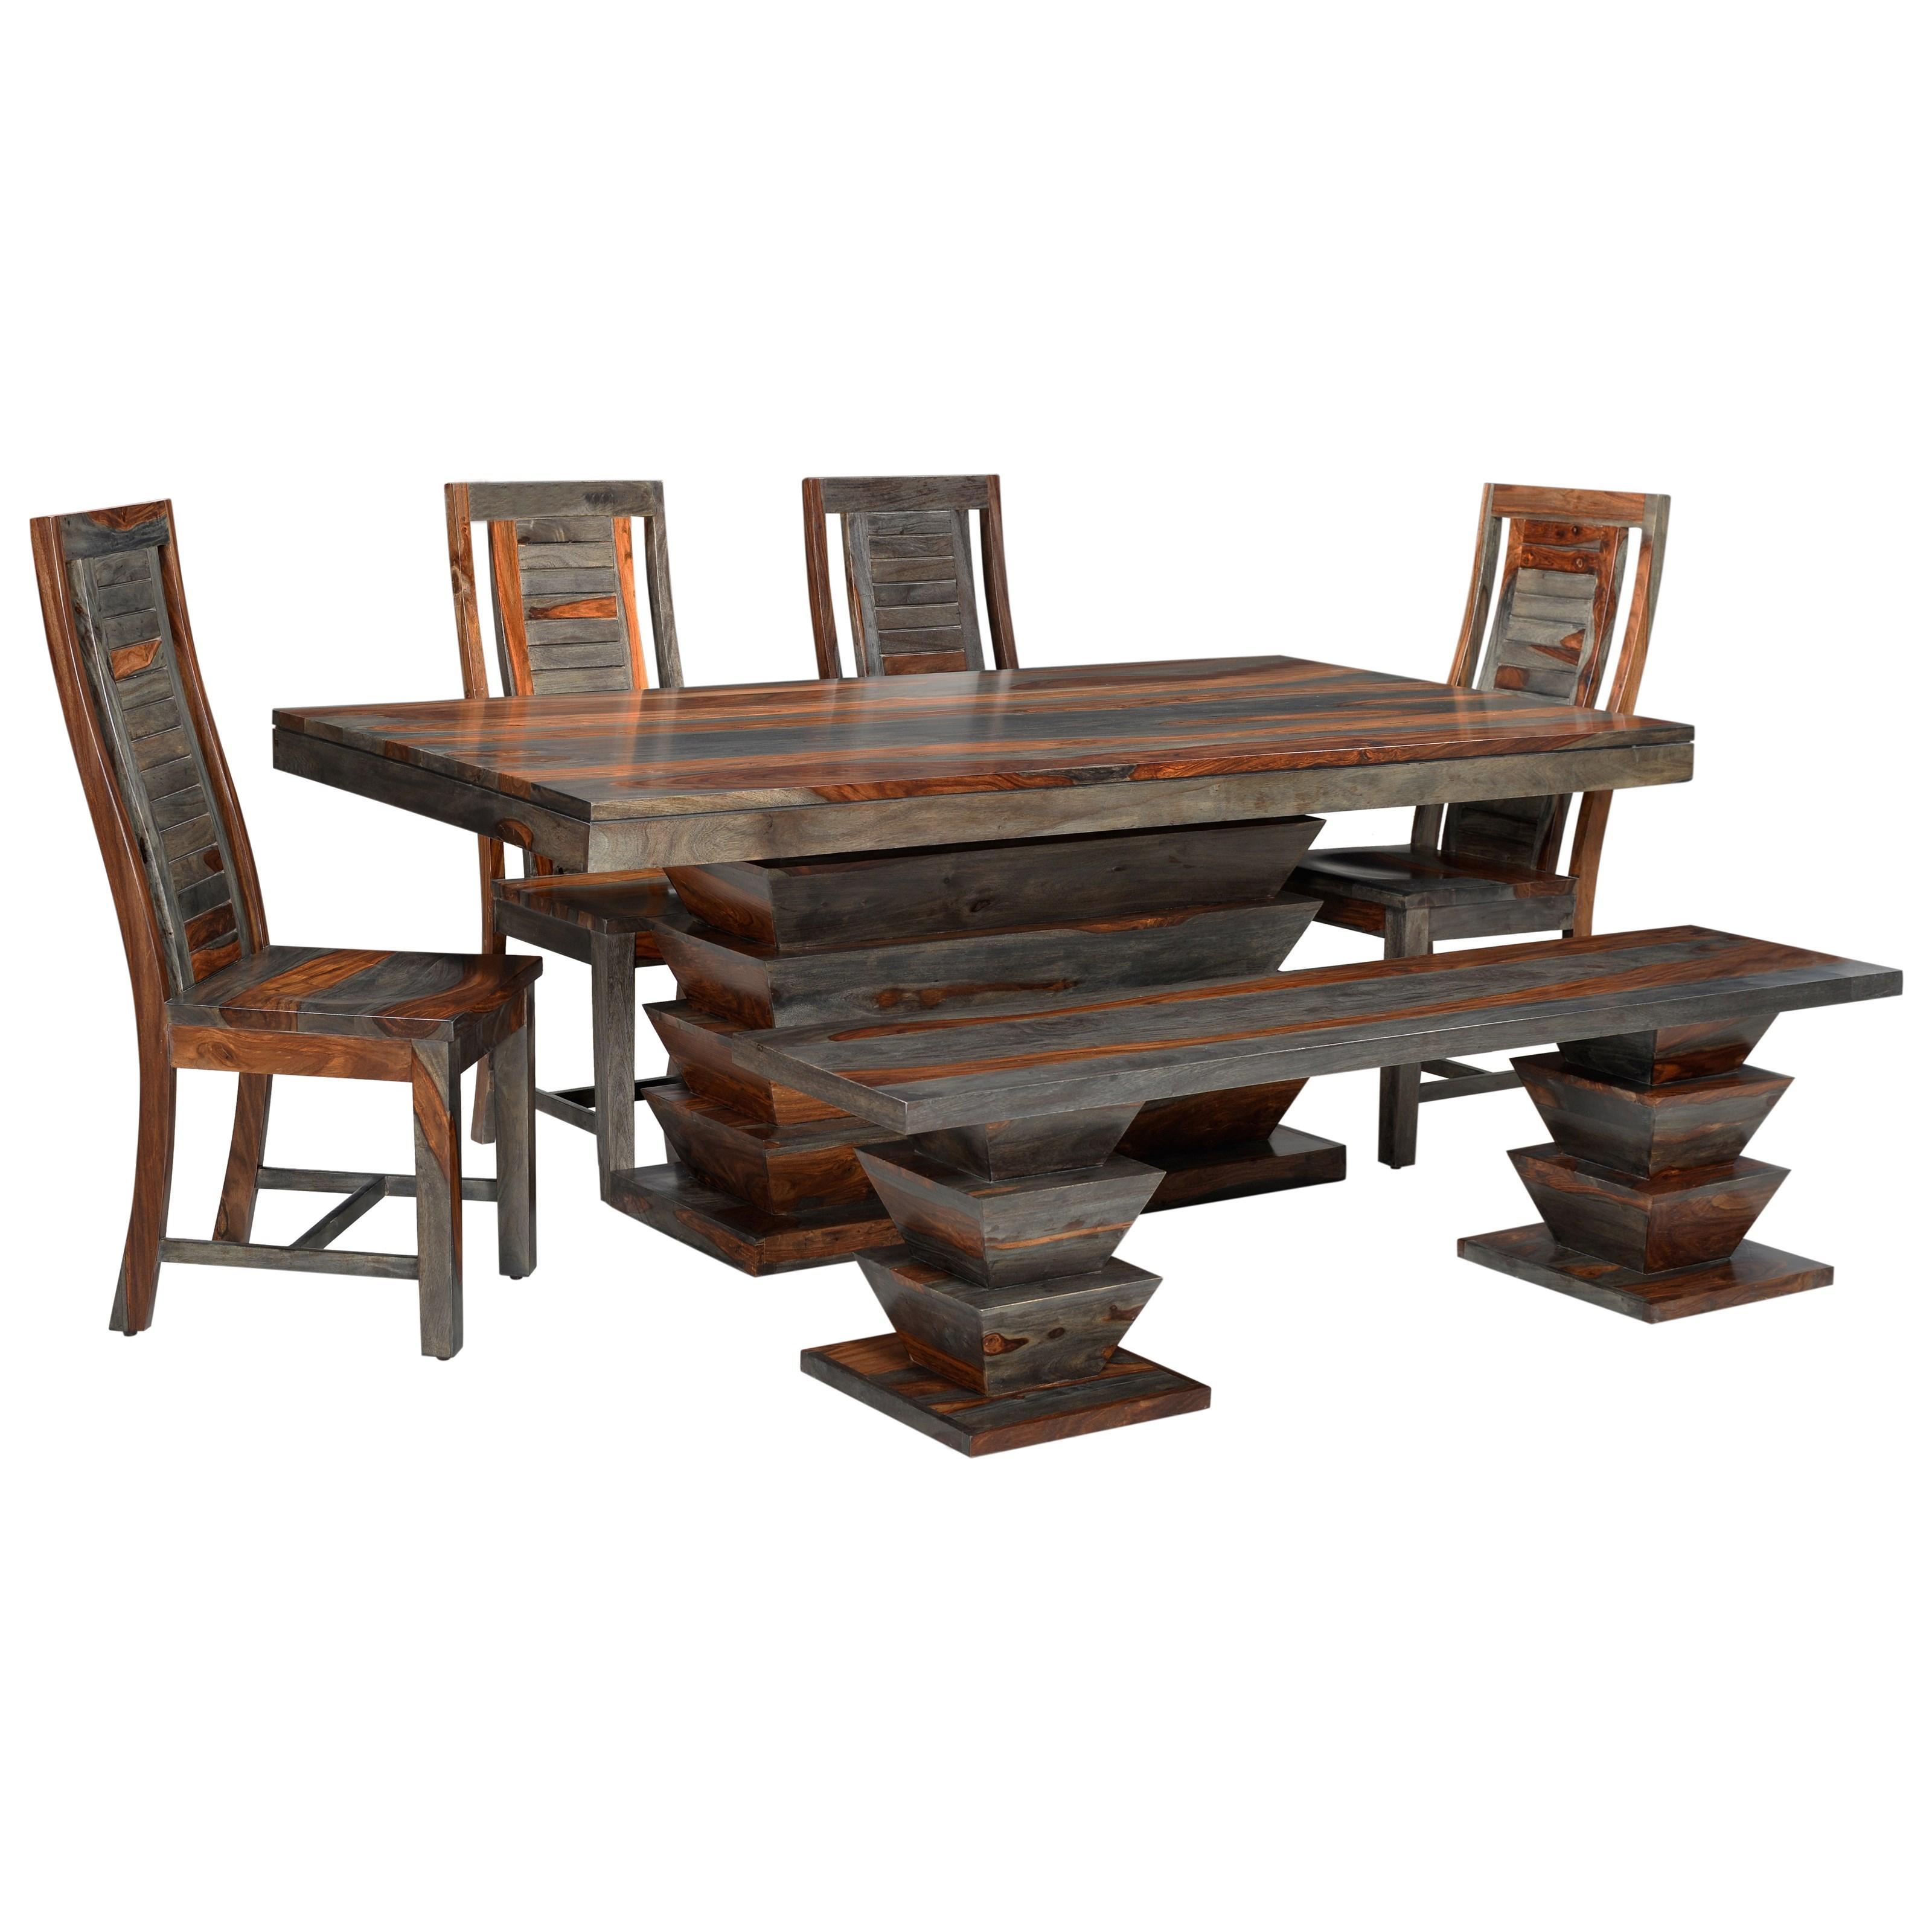 Coast to Coast Imports Capri Table & Chair Set - Item Number: 93443+4x44+45